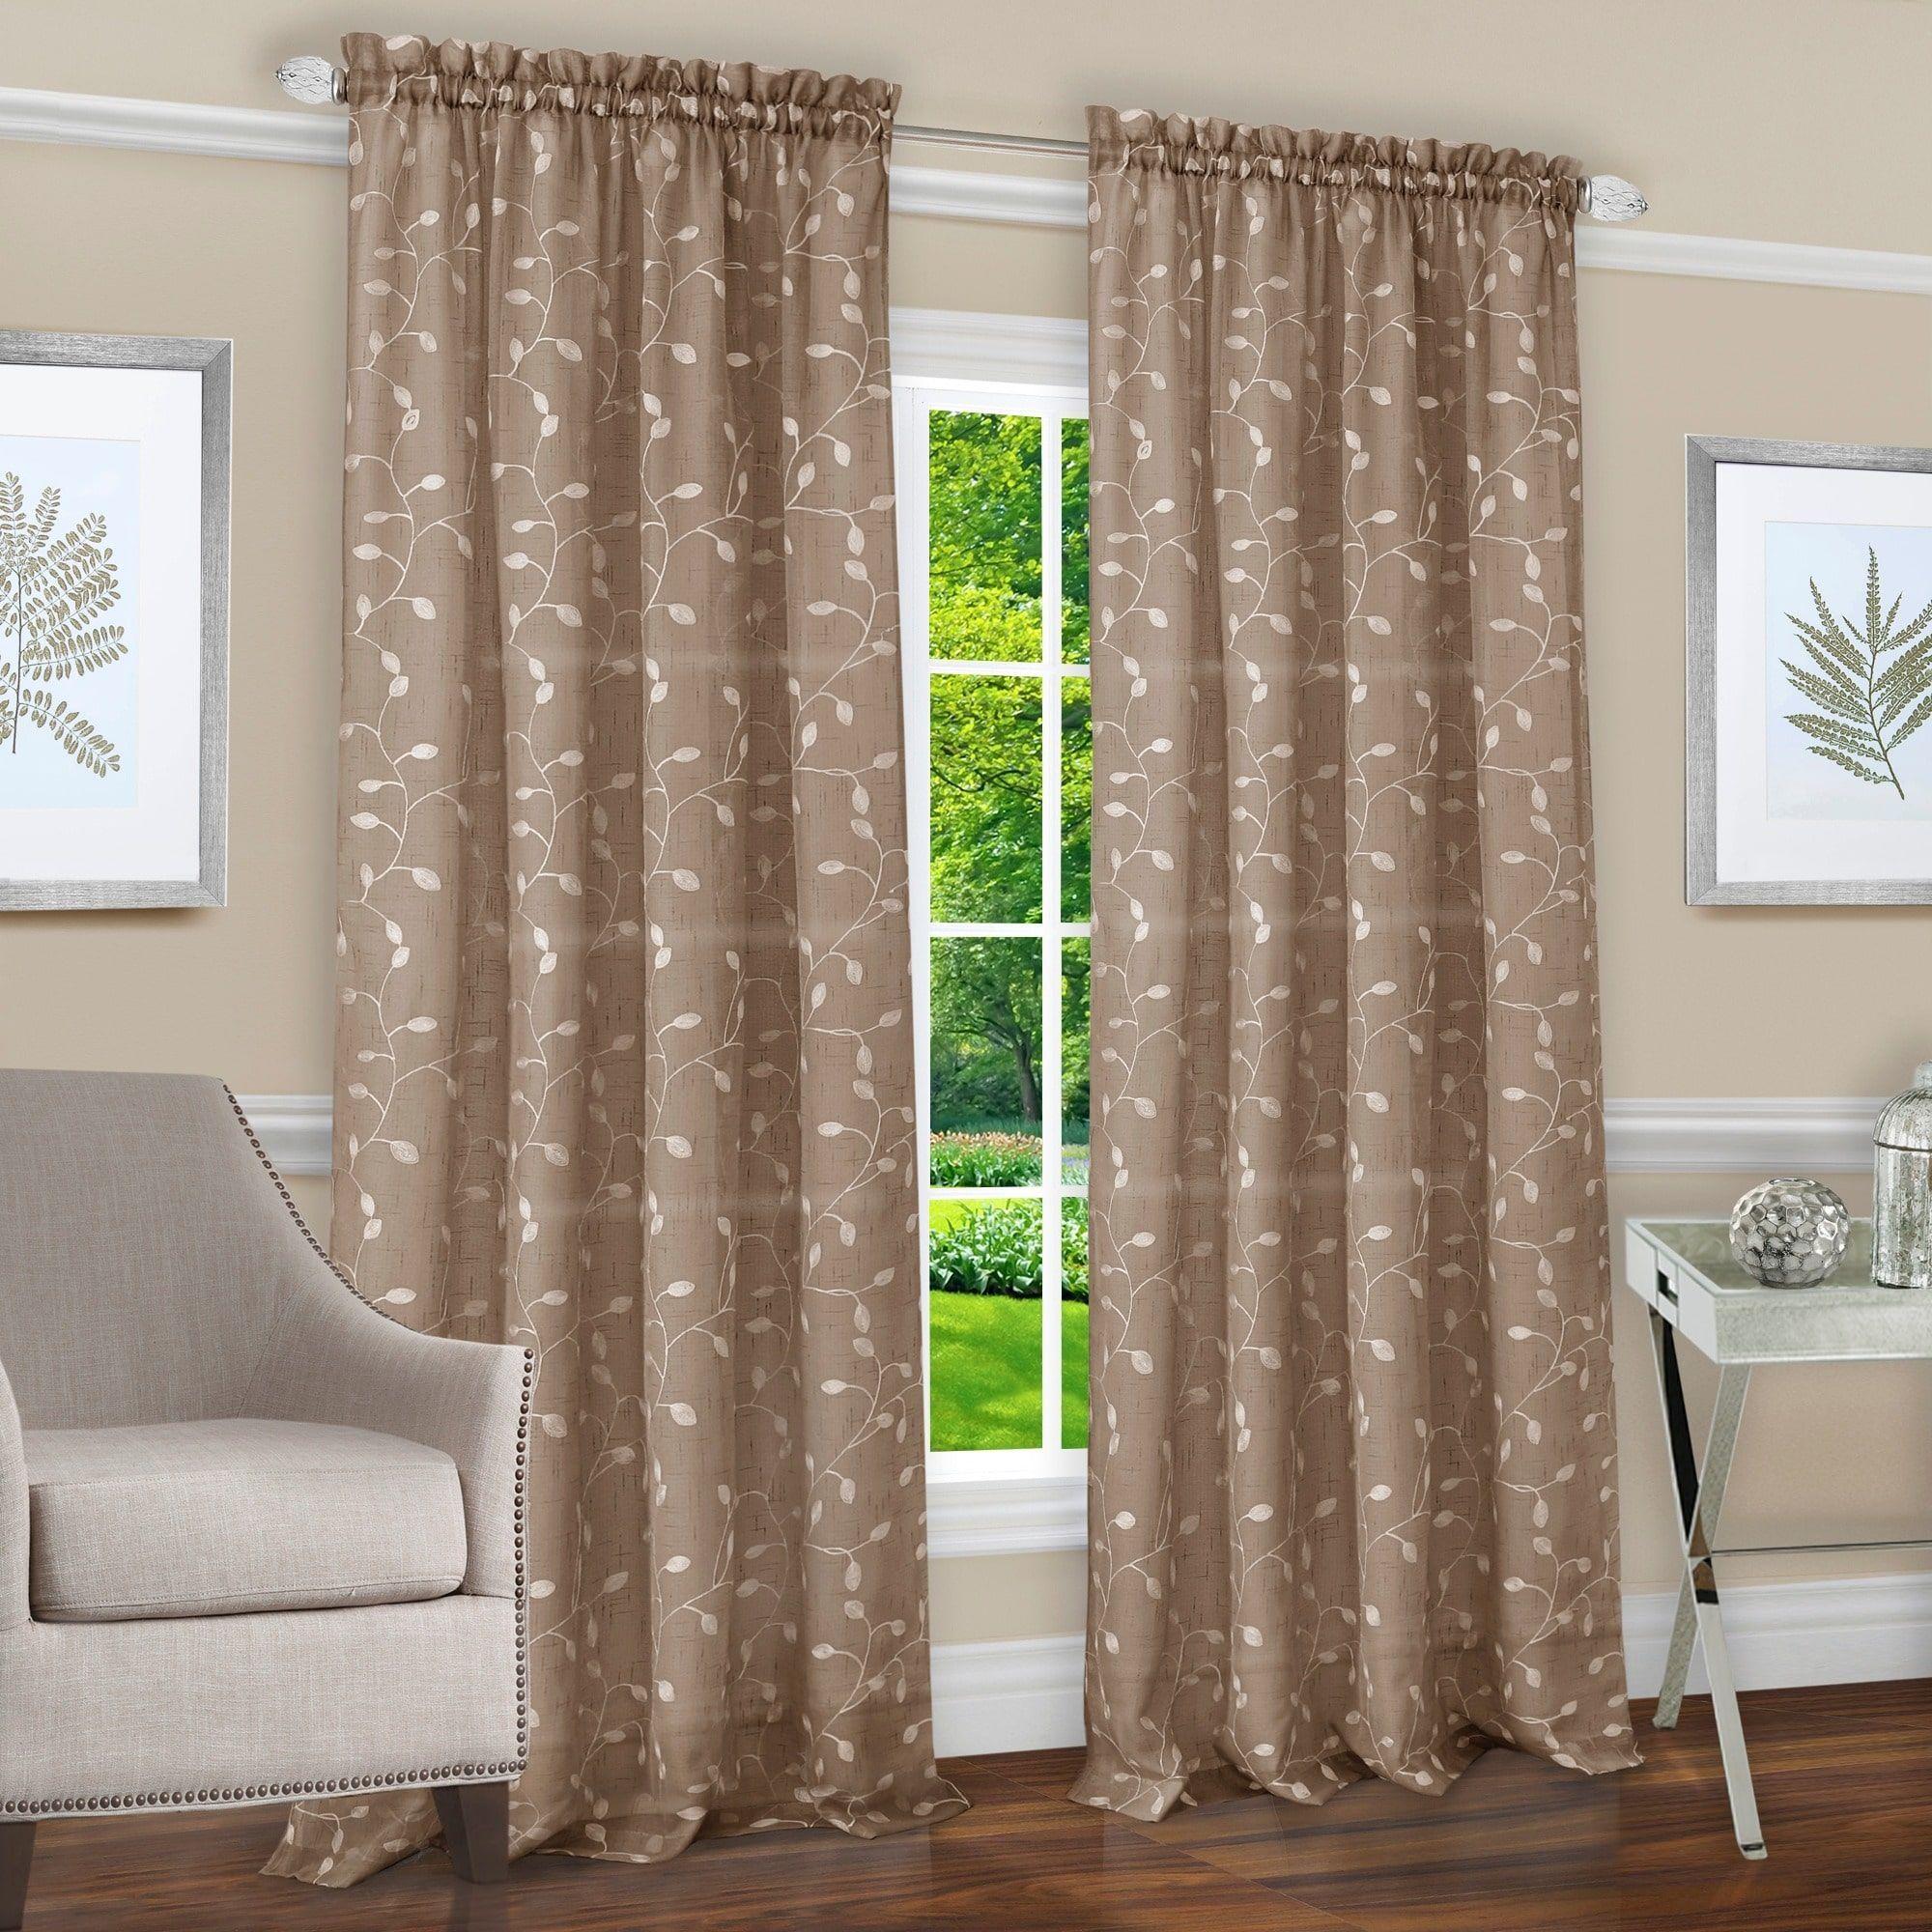 Achim chloe rod pocket window curtain panel inches taupe